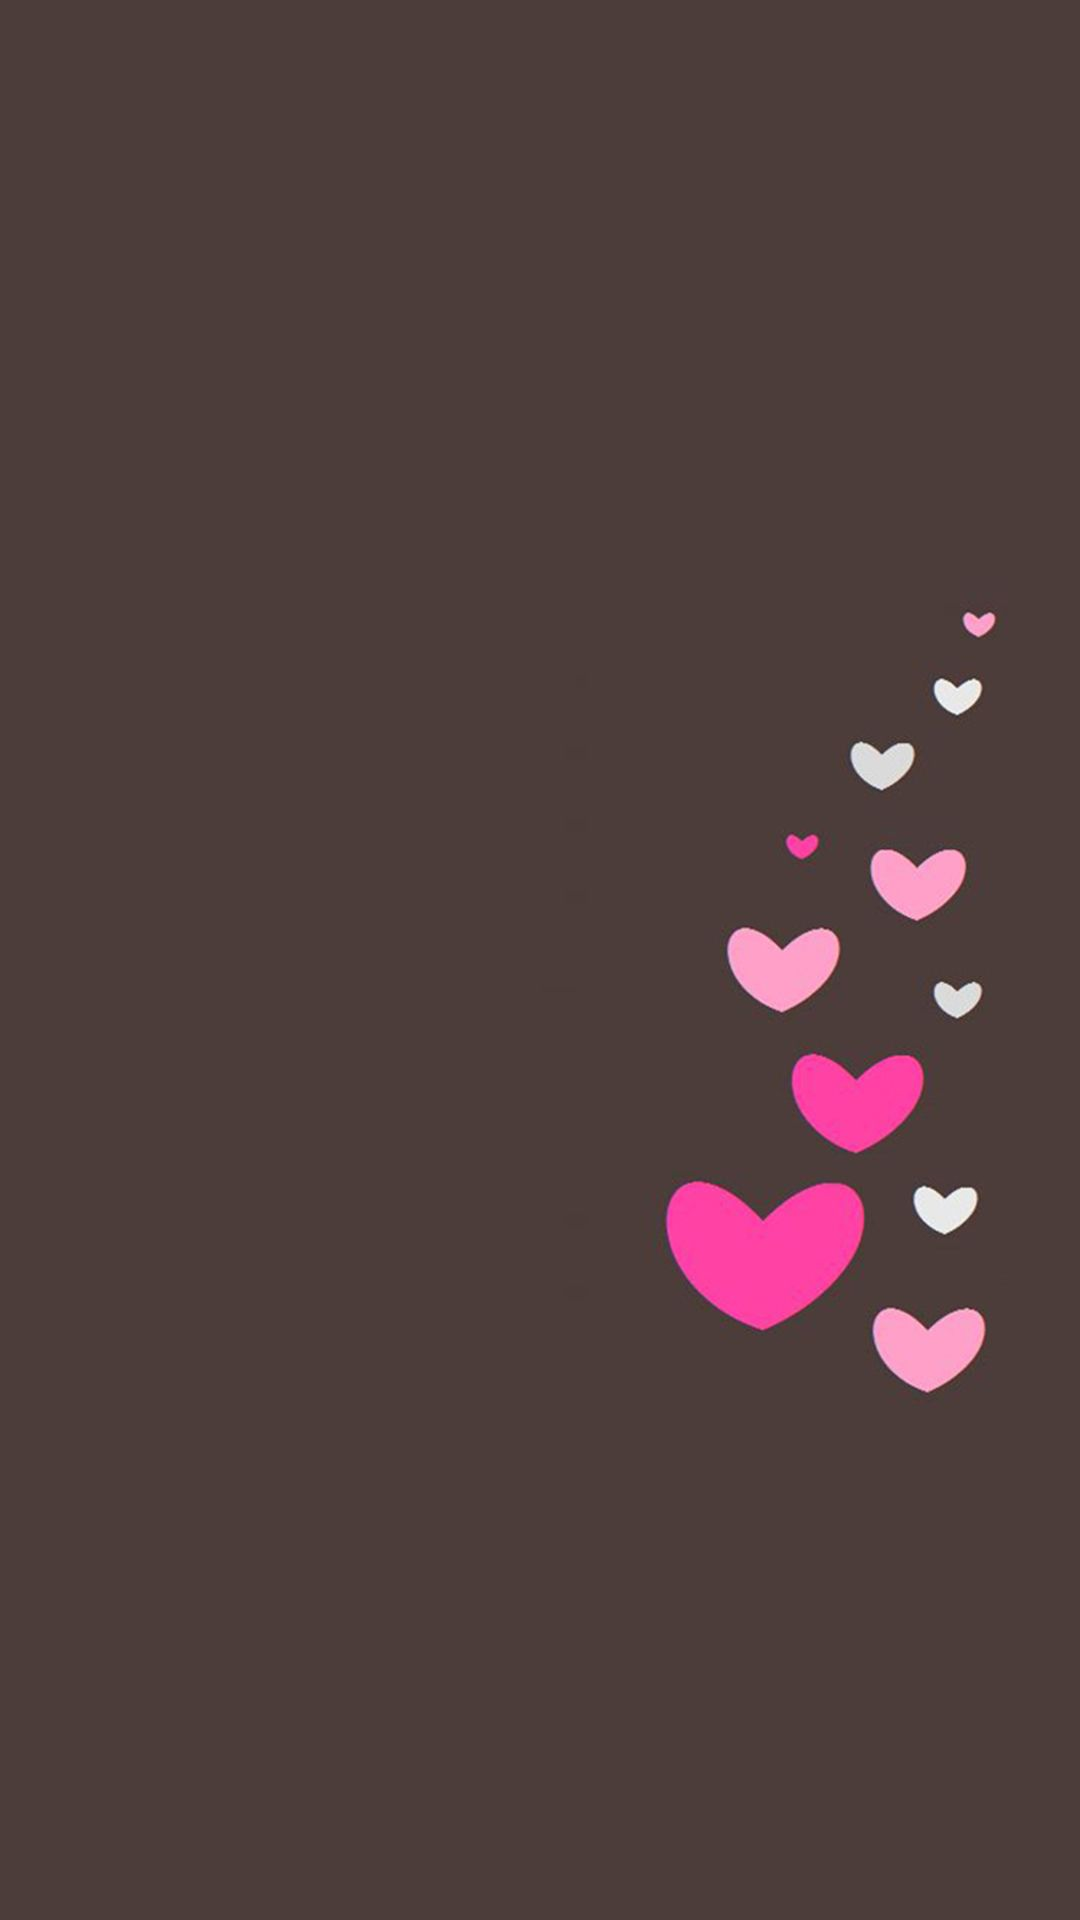 Wonderful Wallpaper Love Iphone 6 Plus - de2385337842c3e72213ac5a46fb93b4  2018_60999.jpg